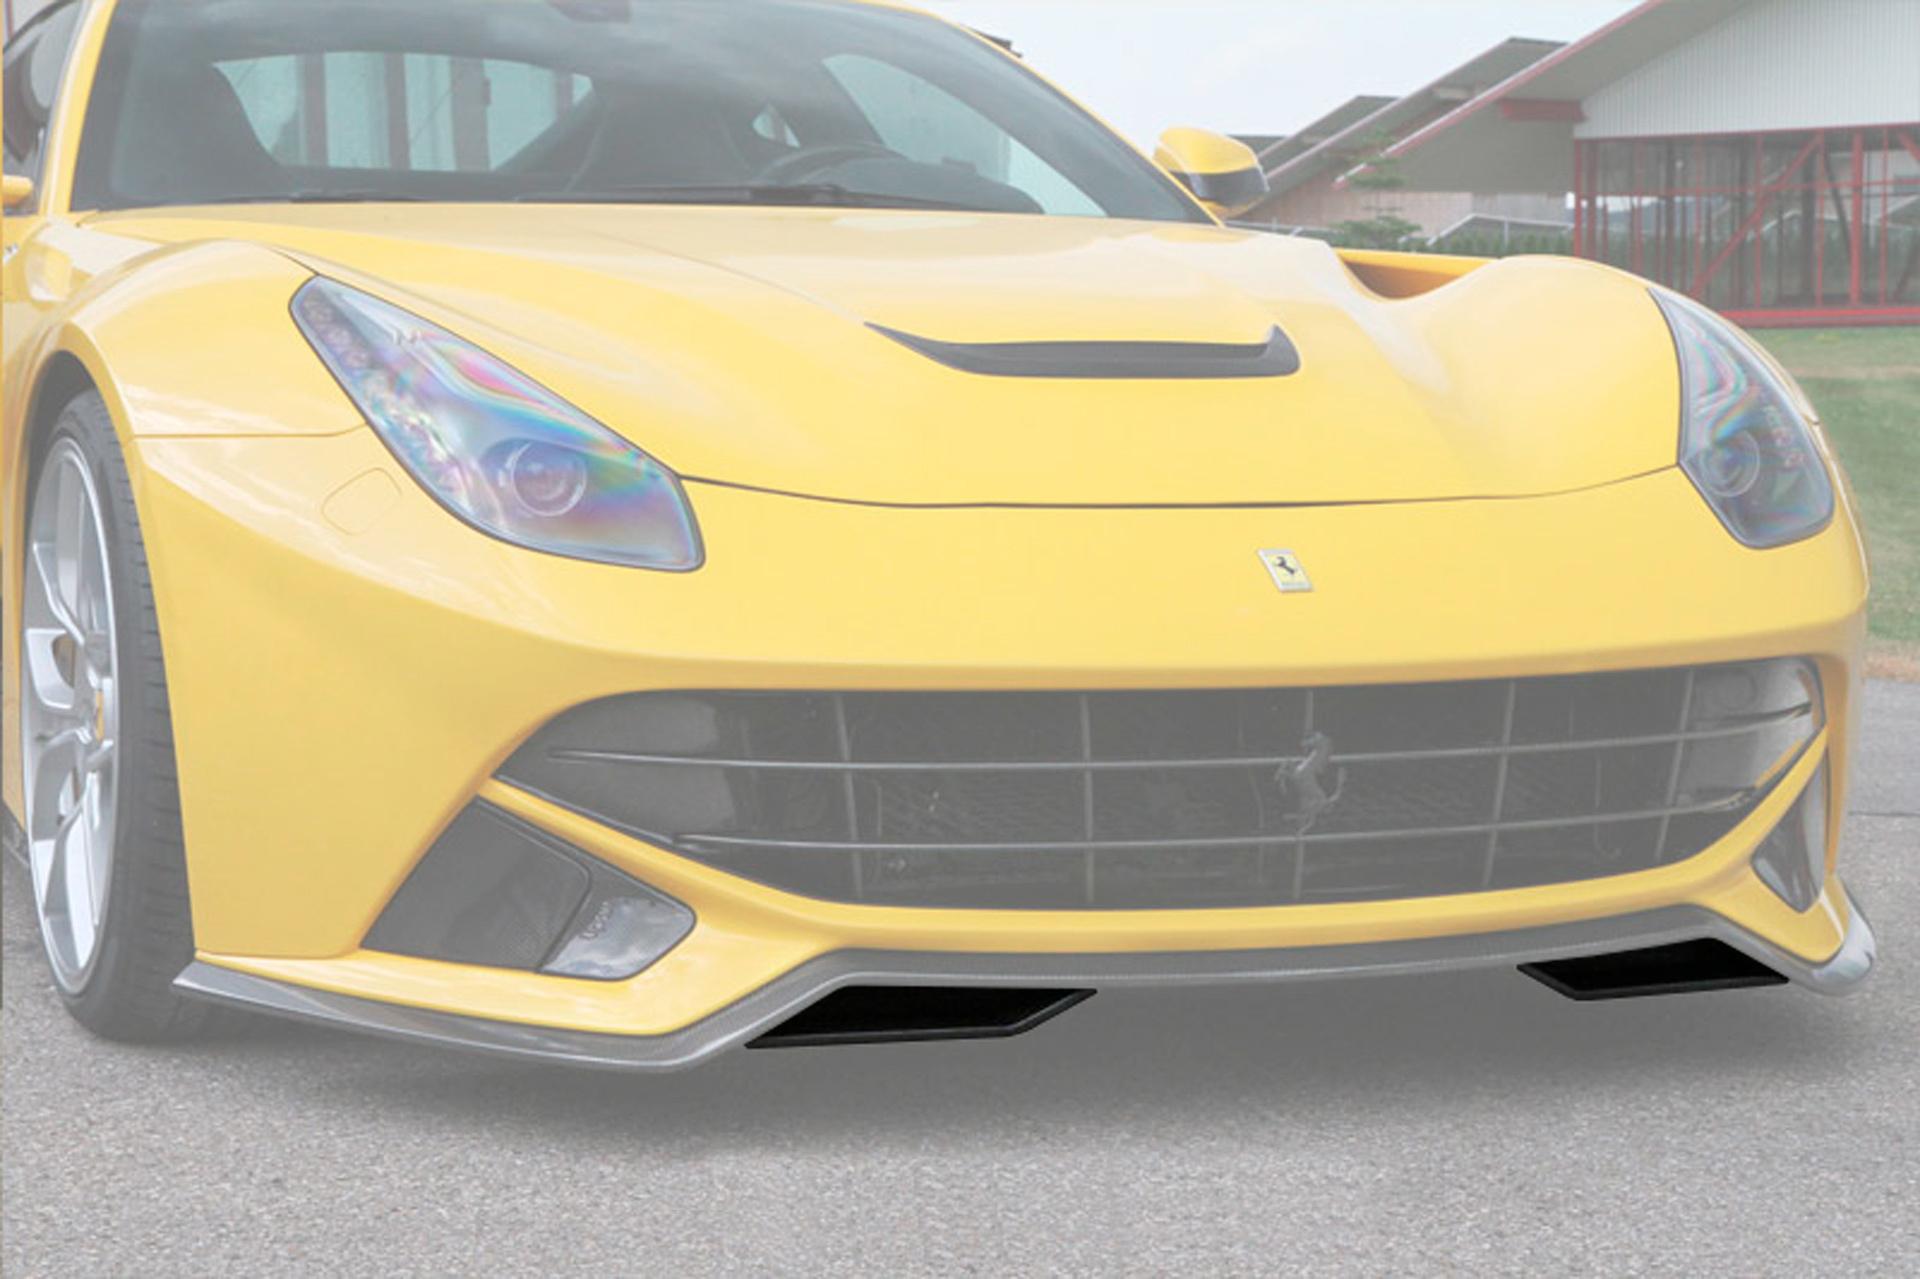 Hodoor Performance Carbon fiber front bumper spoiler pads Novitec Style for Ferrari F12 Berlinetta